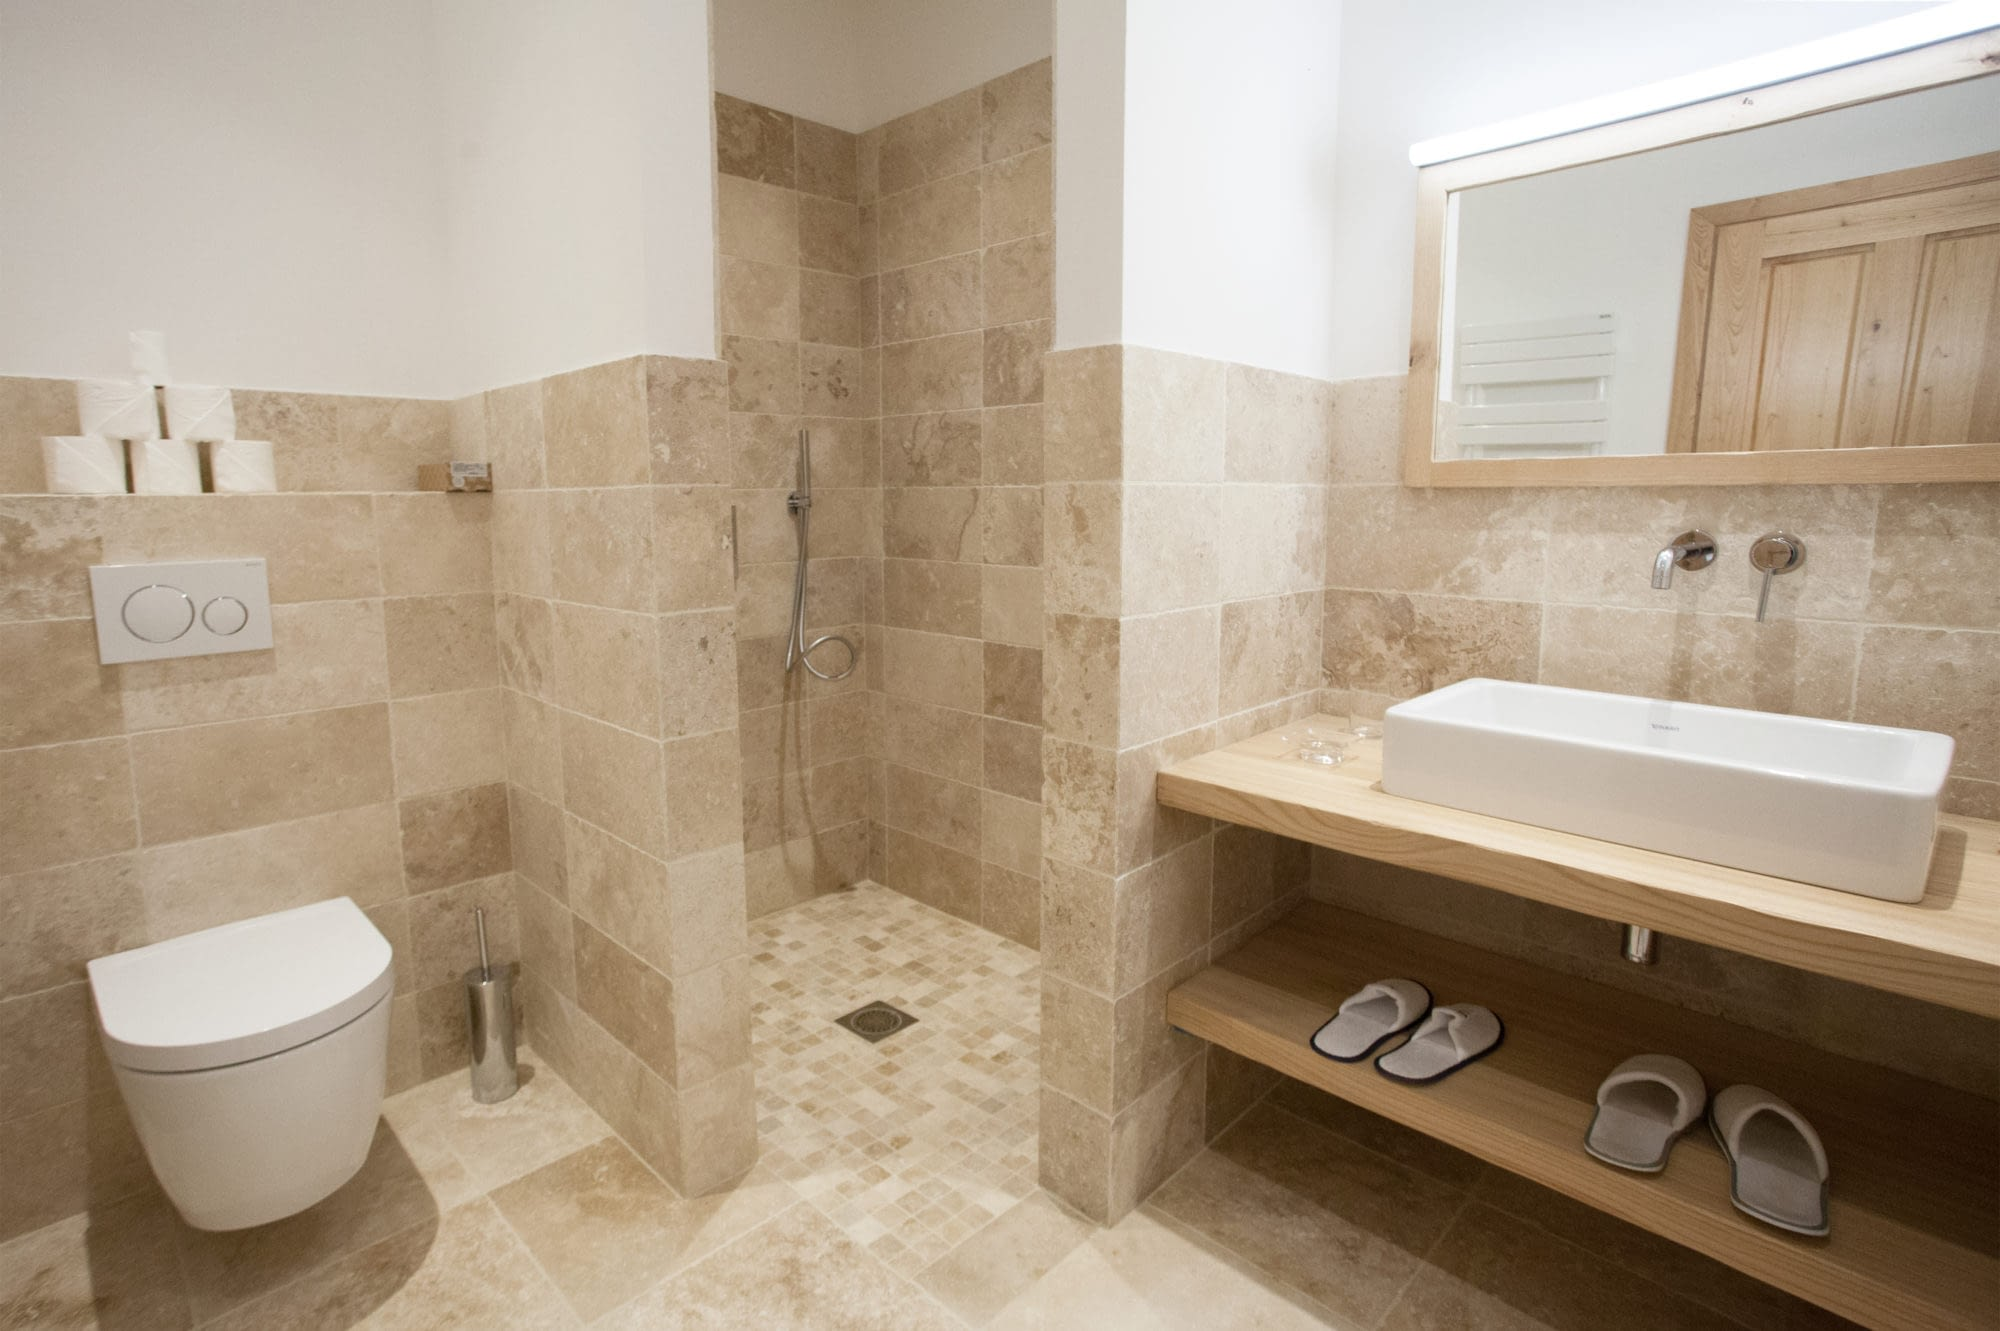 Salle de bain avec douche / Bathroom with shower